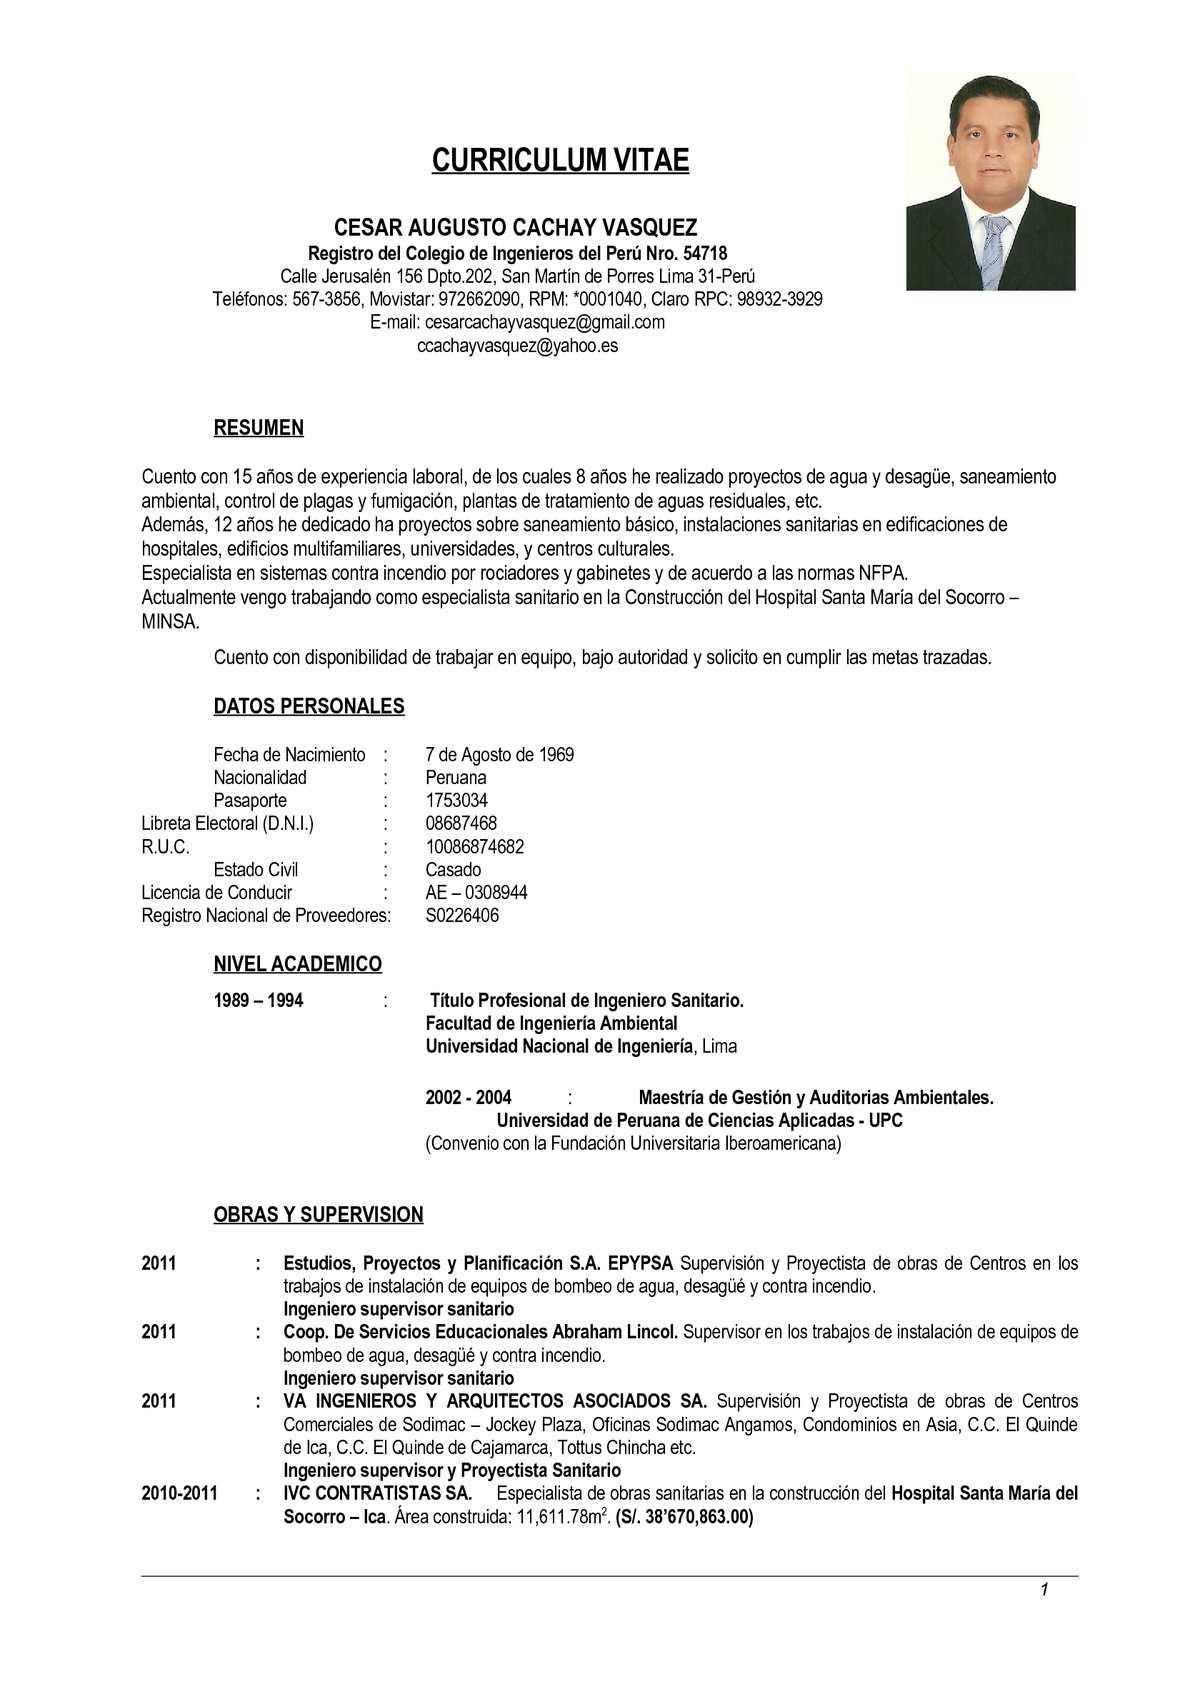 21 Luxury Curriculum Vitae Modelo Peru Free Resume Templates